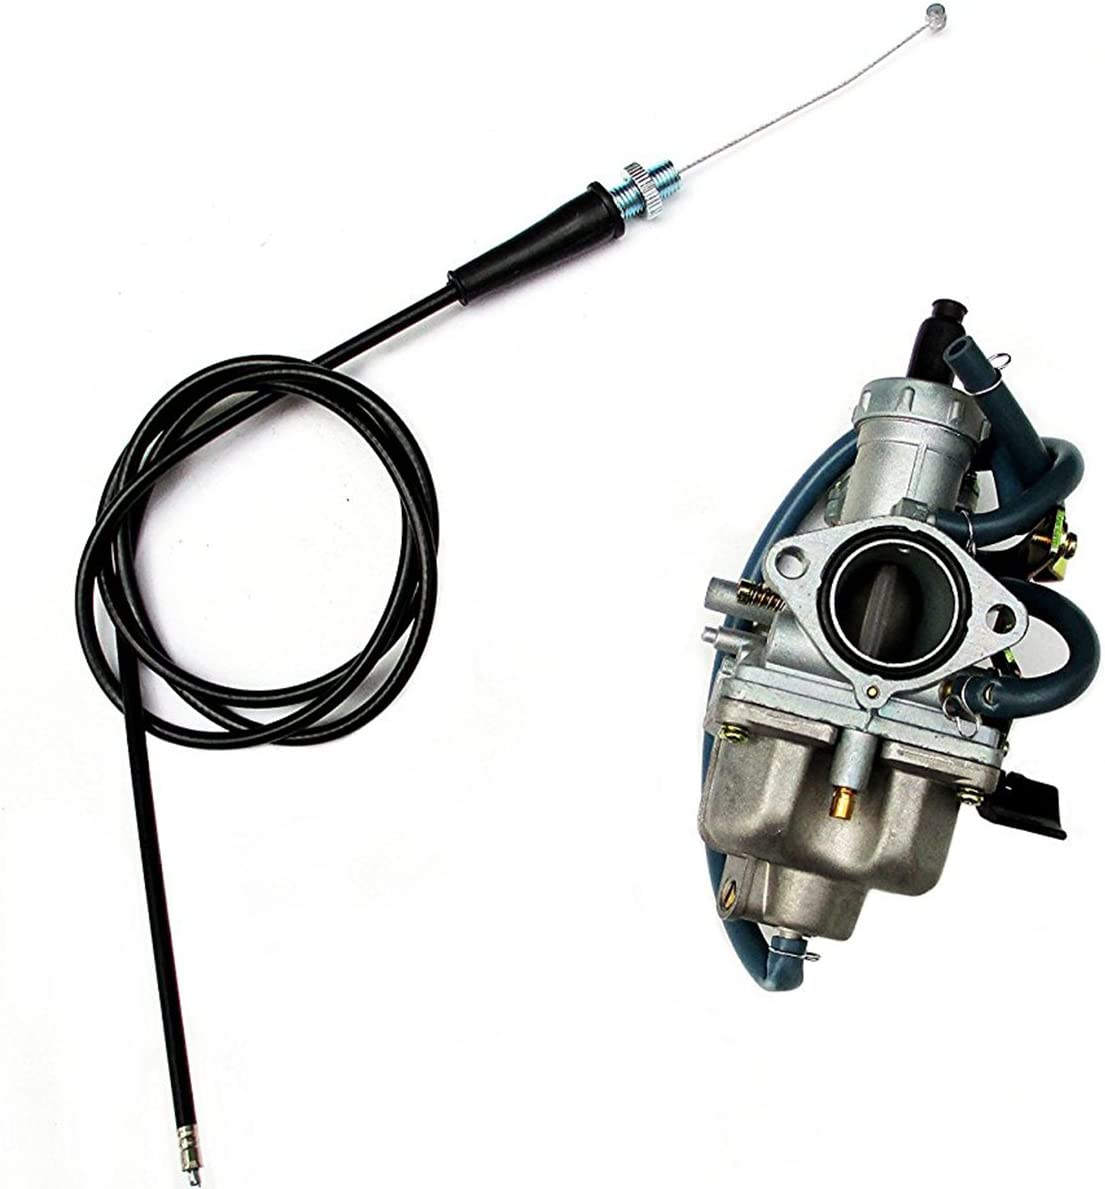 Nuevo carburador para Honda TRX 250 TM Fourtrax Recon TRX250 ...